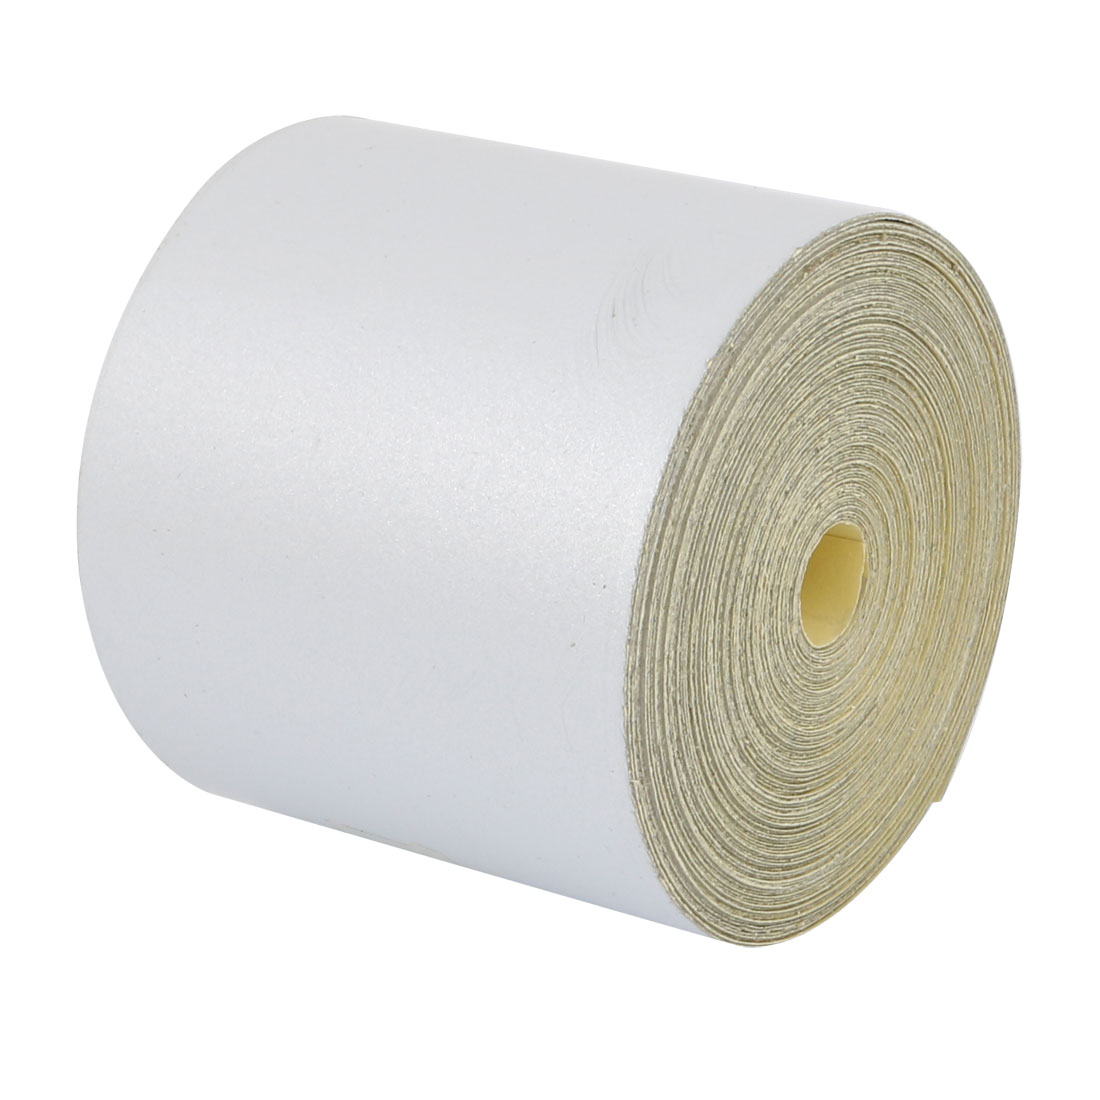 5cm Wide 10 Meters Long Sealing Adhesive Reflective Warning Tape Sliver-white